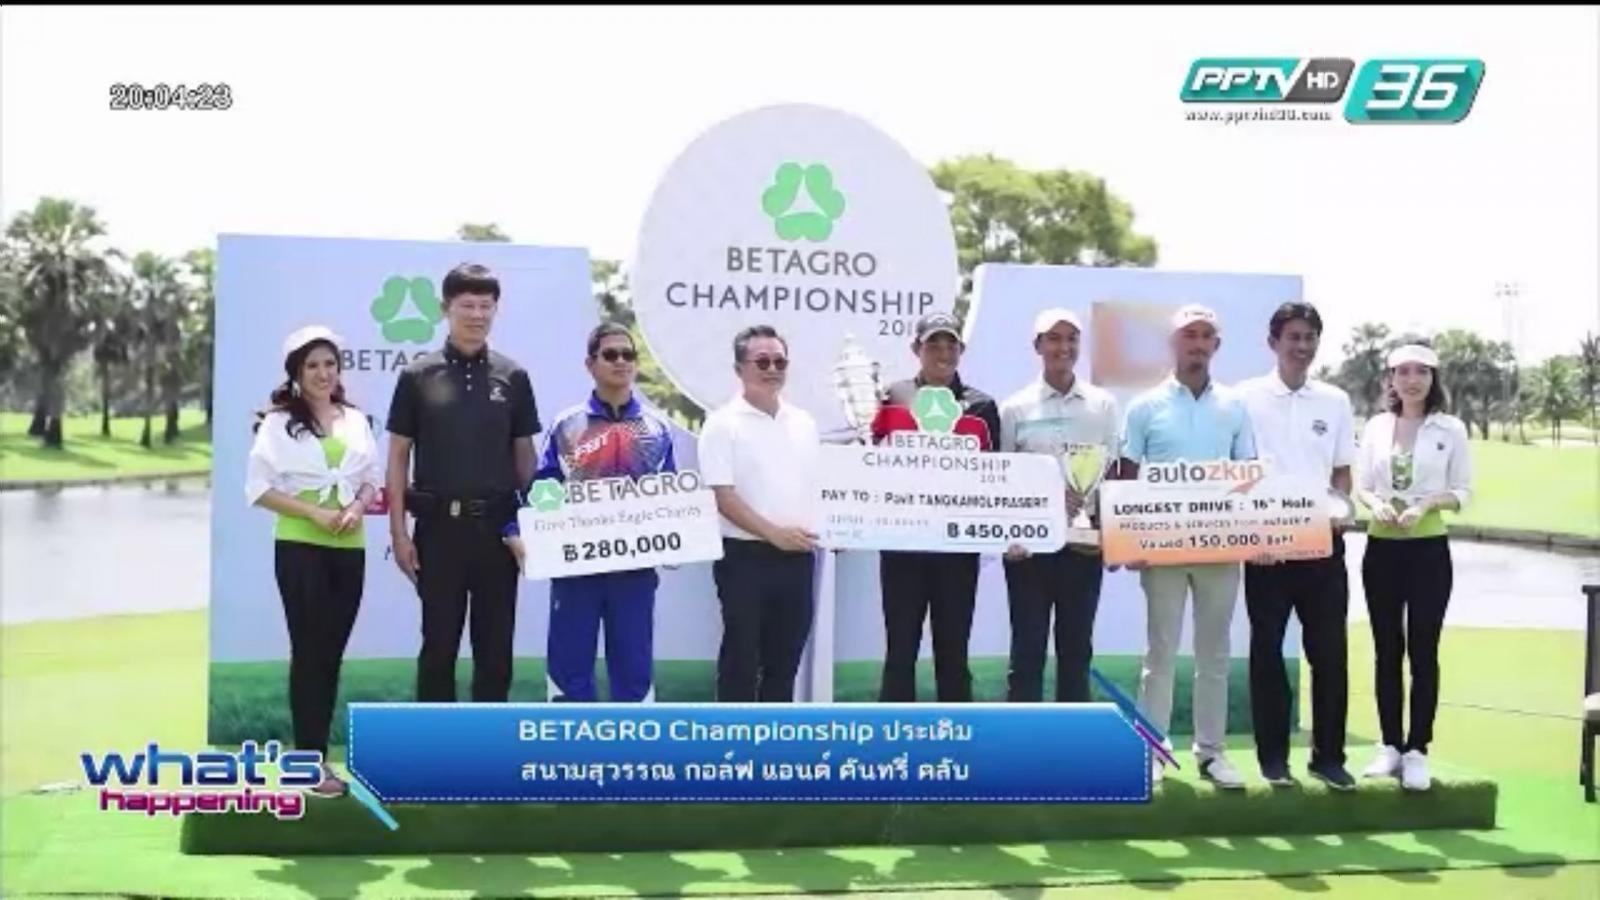 BETAGRO Championship ประเดิม สนามสุวรรณ กอล์ฟ แอนด์ คันทรี่ คลับ